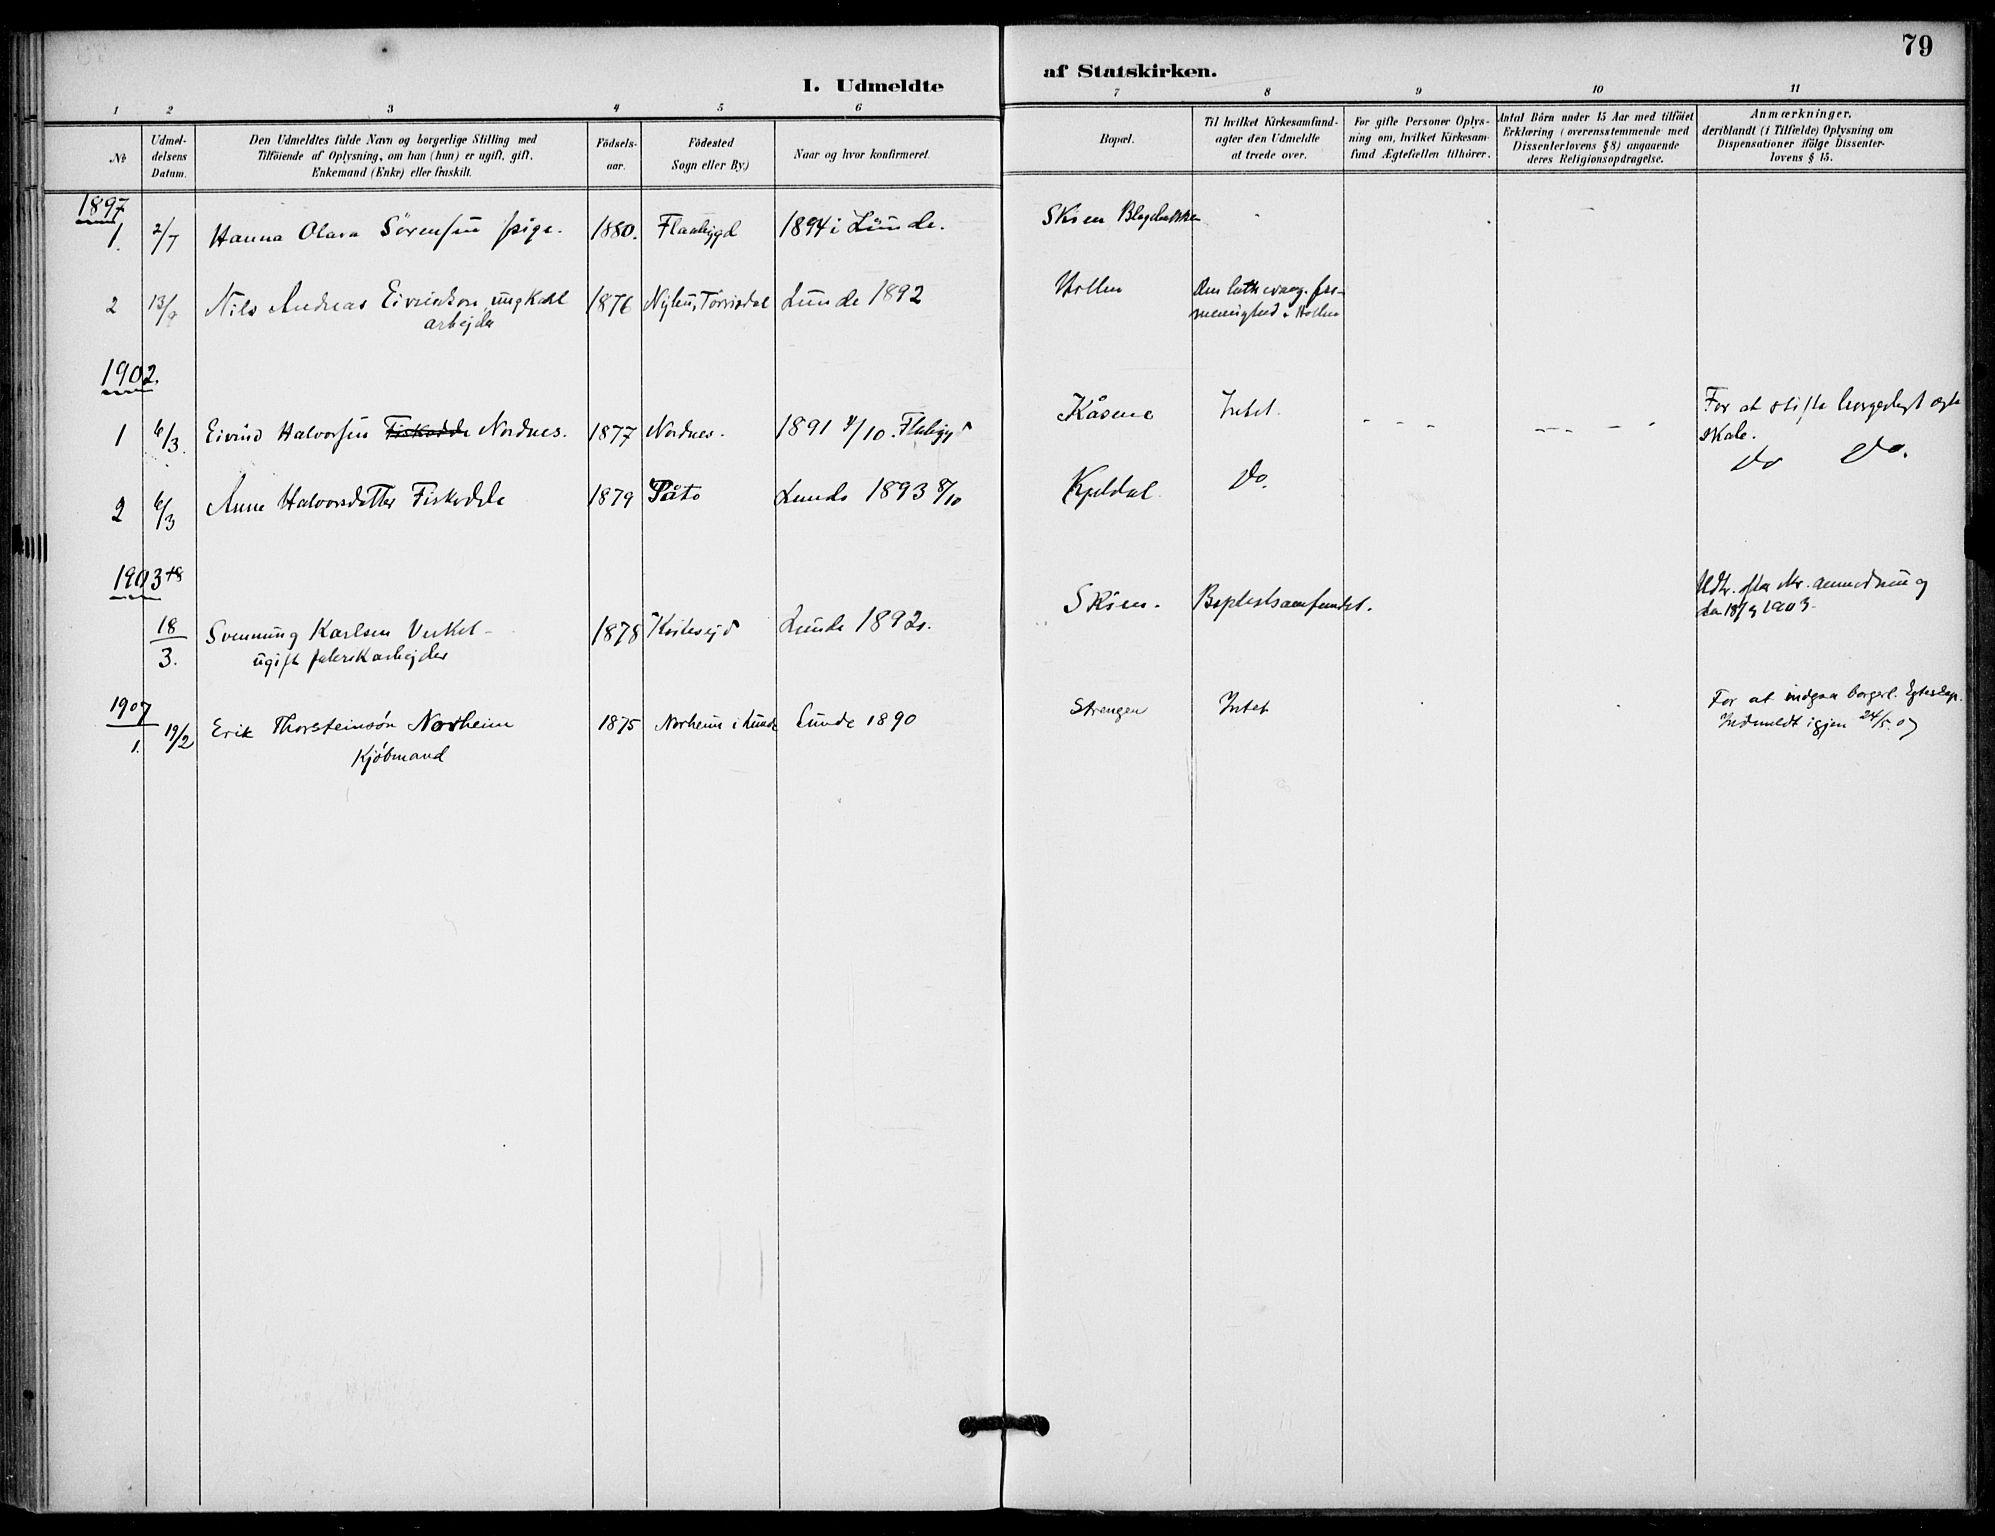 SAKO, Lunde kirkebøker, F/Fb/L0004: Ministerialbok nr. II 4, 1892-1907, s. 79